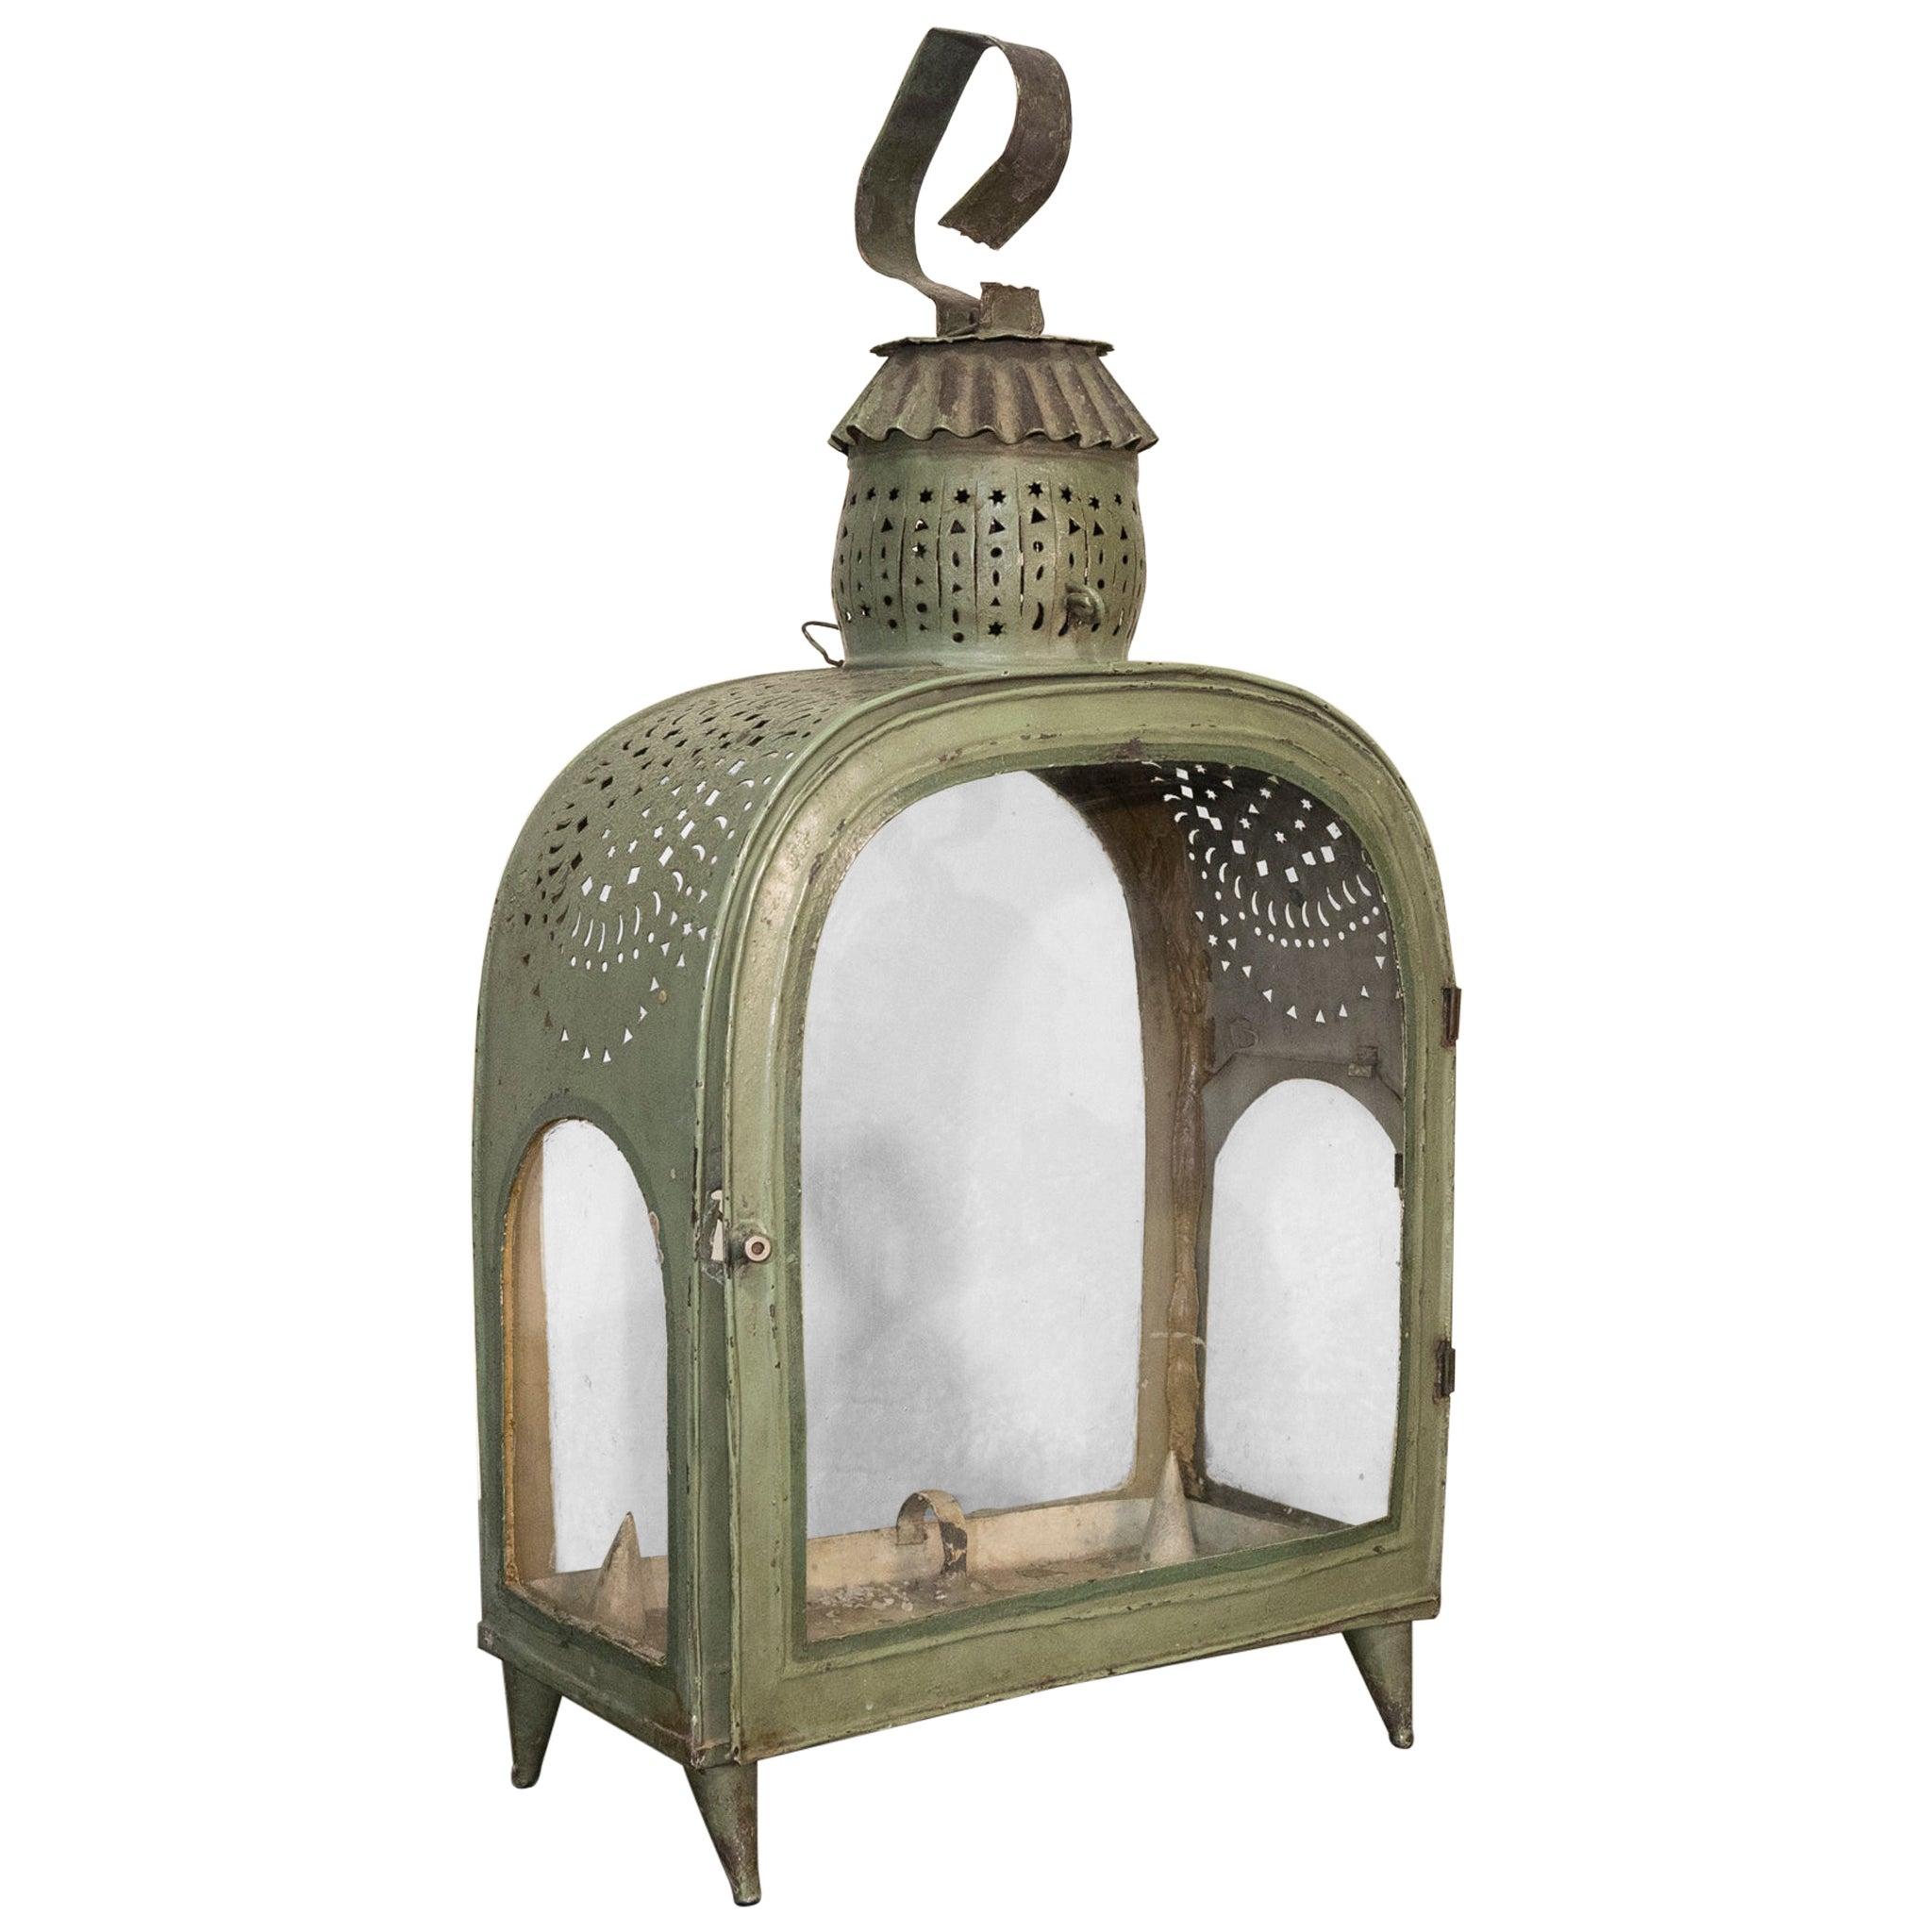 Early 20th Century French Green Toleware Garden Lantern, Glazed